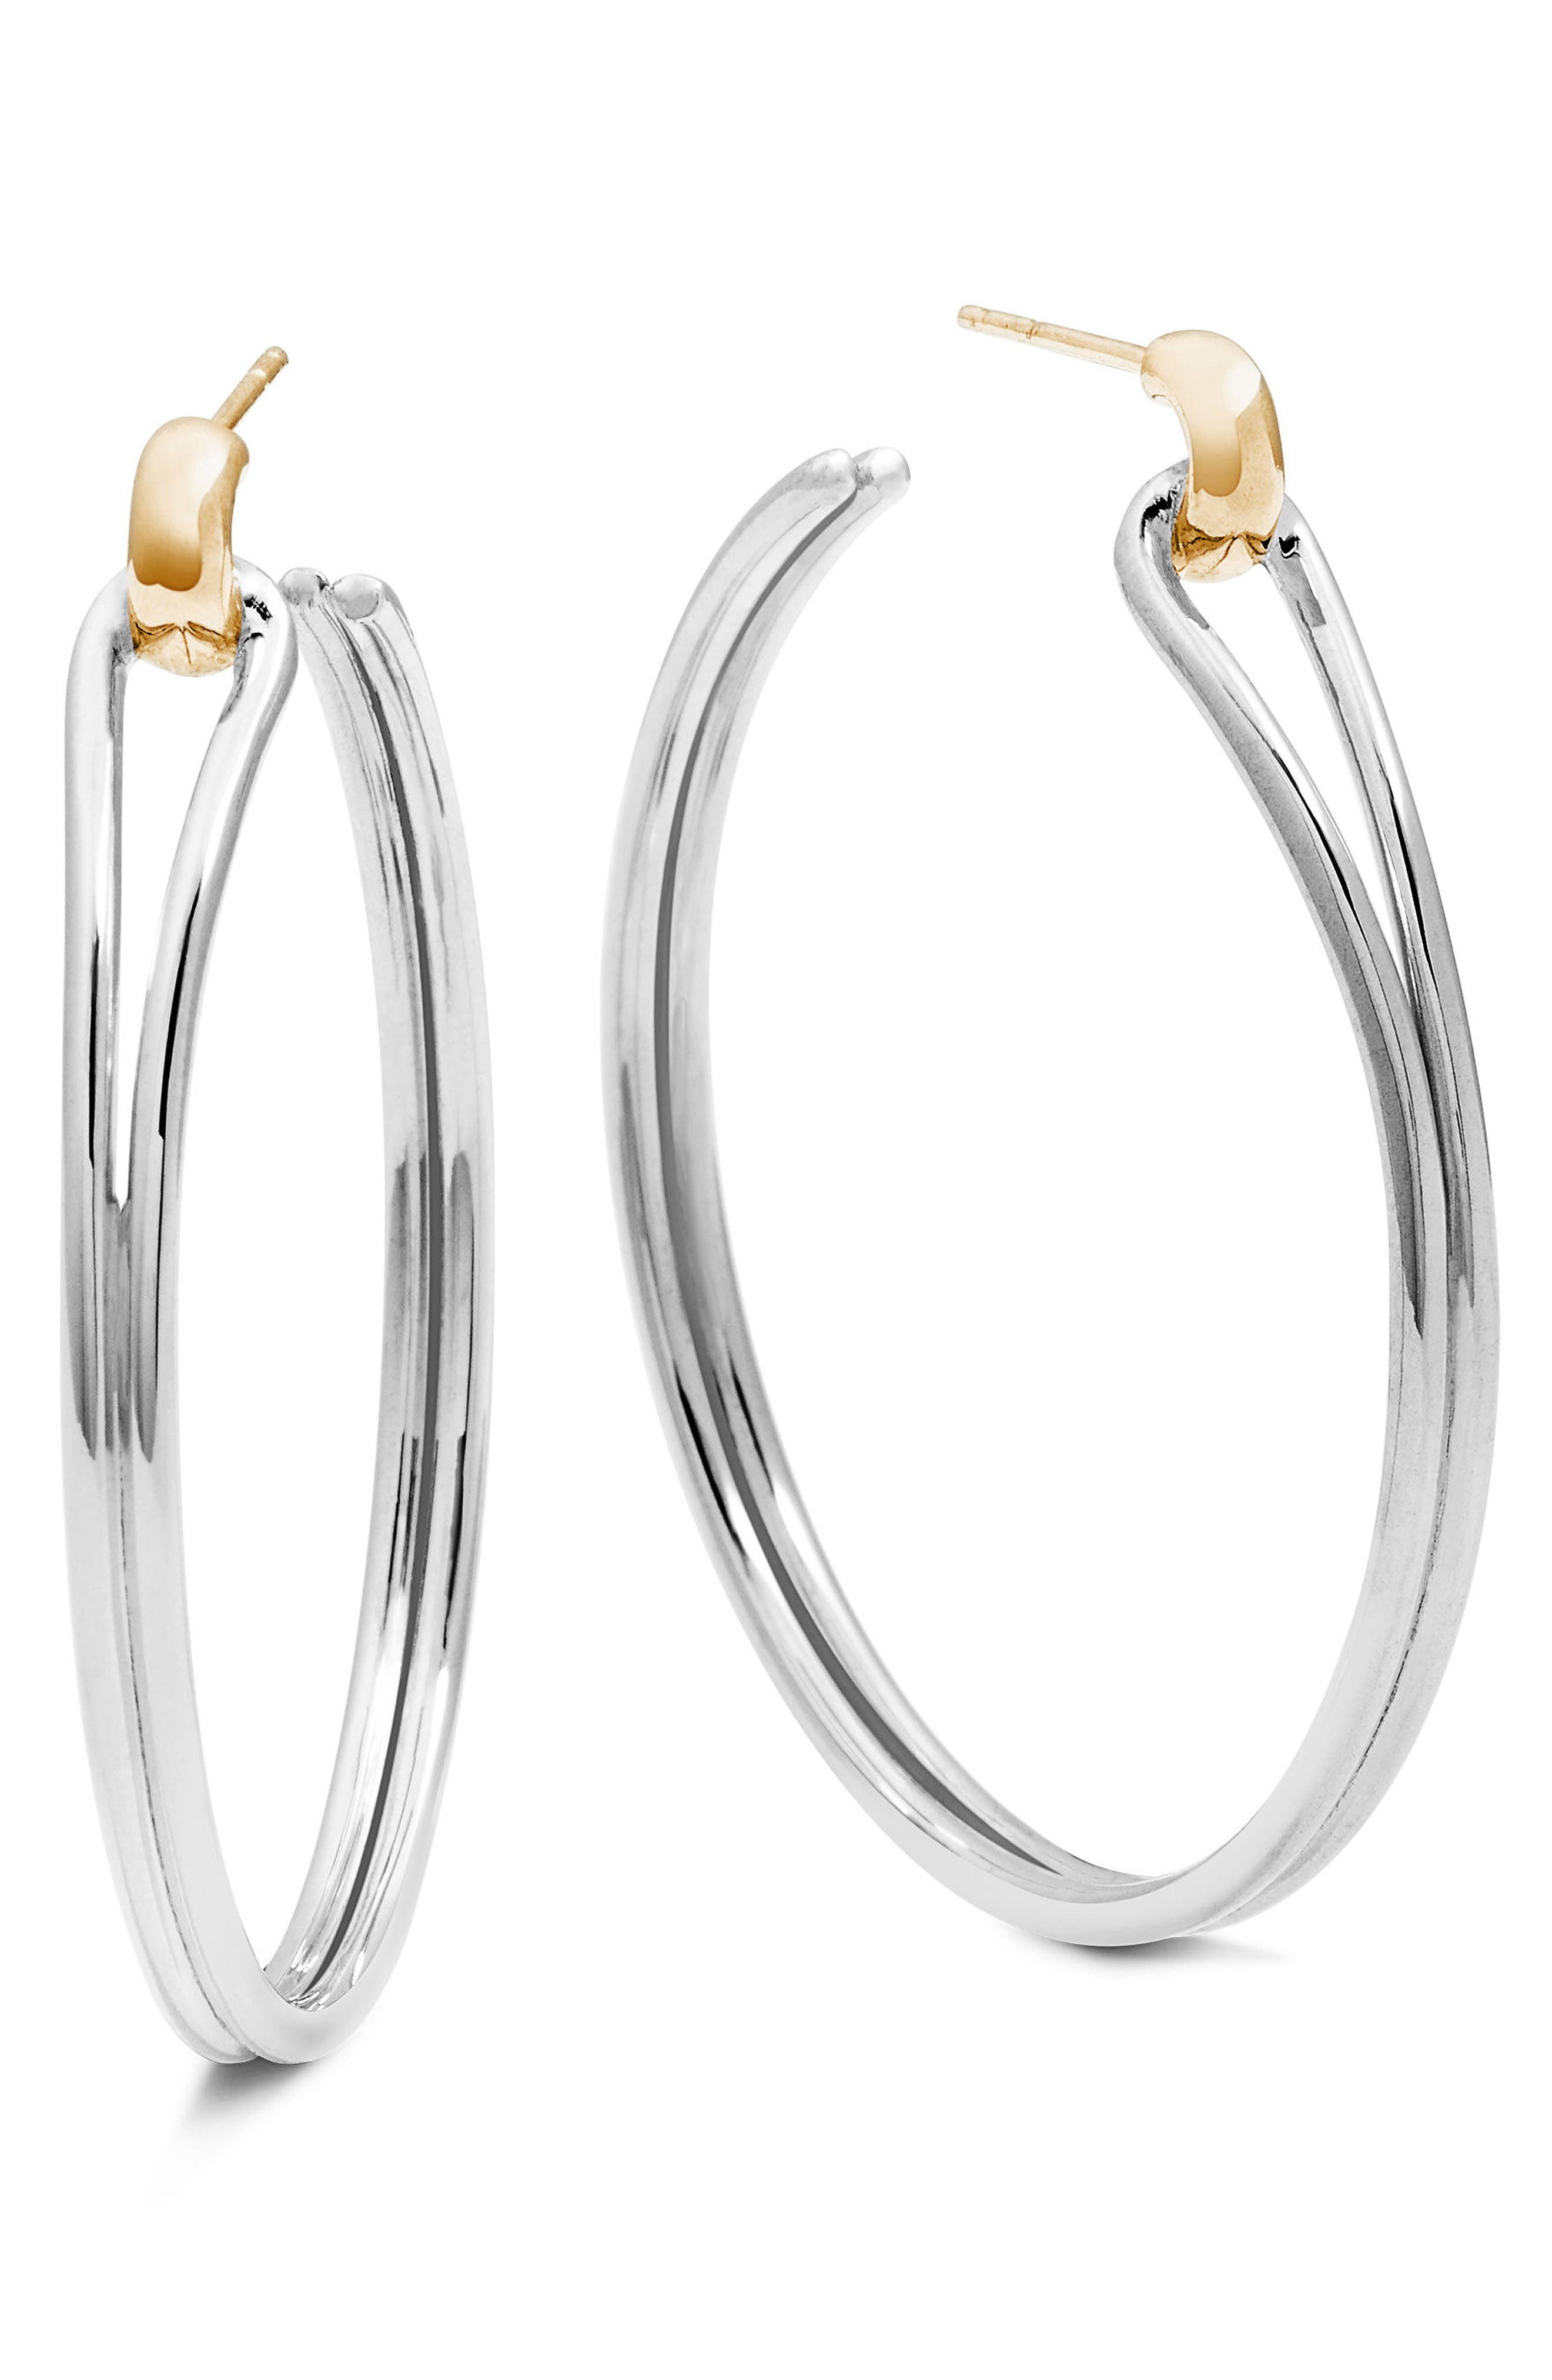 Shinola Lug Hoop Earrings